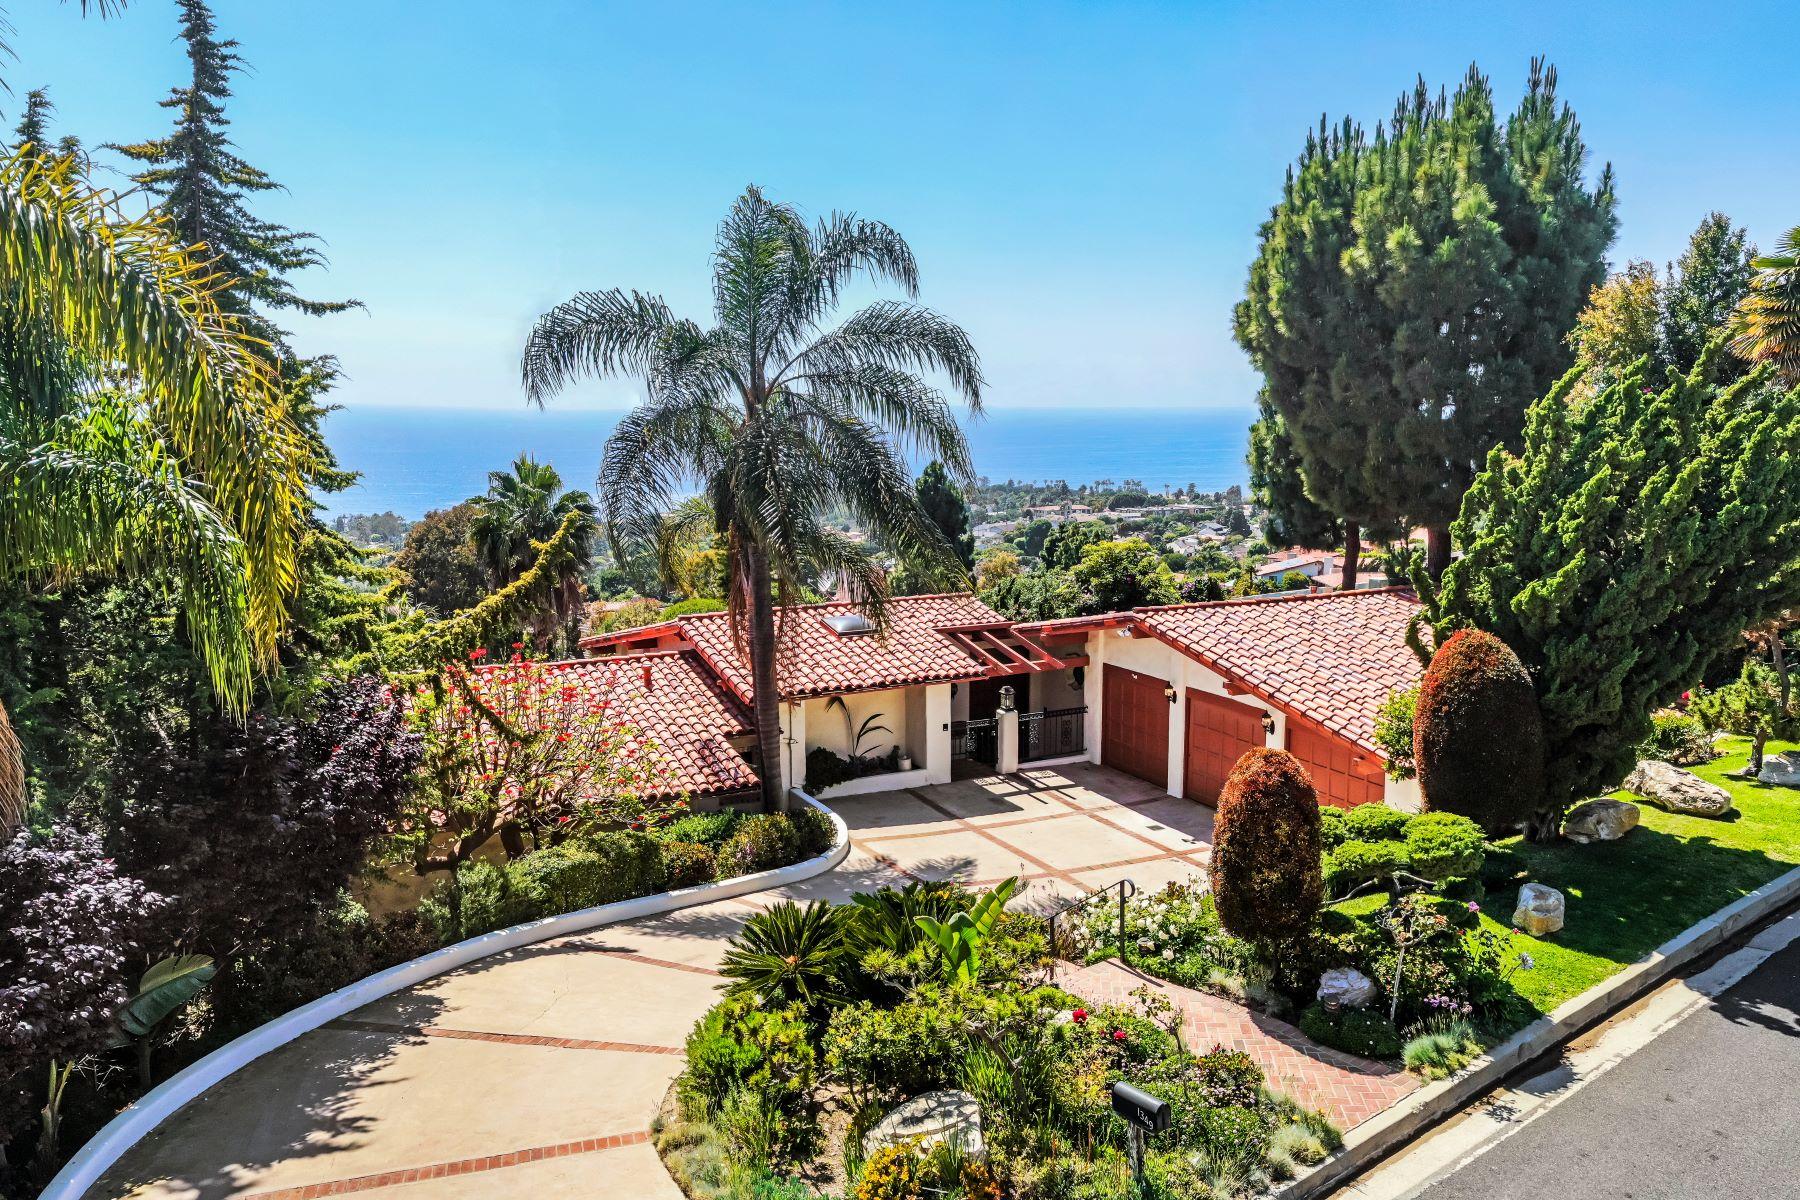 Single Family Homes for Sale at 1349 Vía Zumaya, Palos Verdes Estates, CA 90274 1349 Vía Zumaya Palos Verdes Estates, California 90274 United States